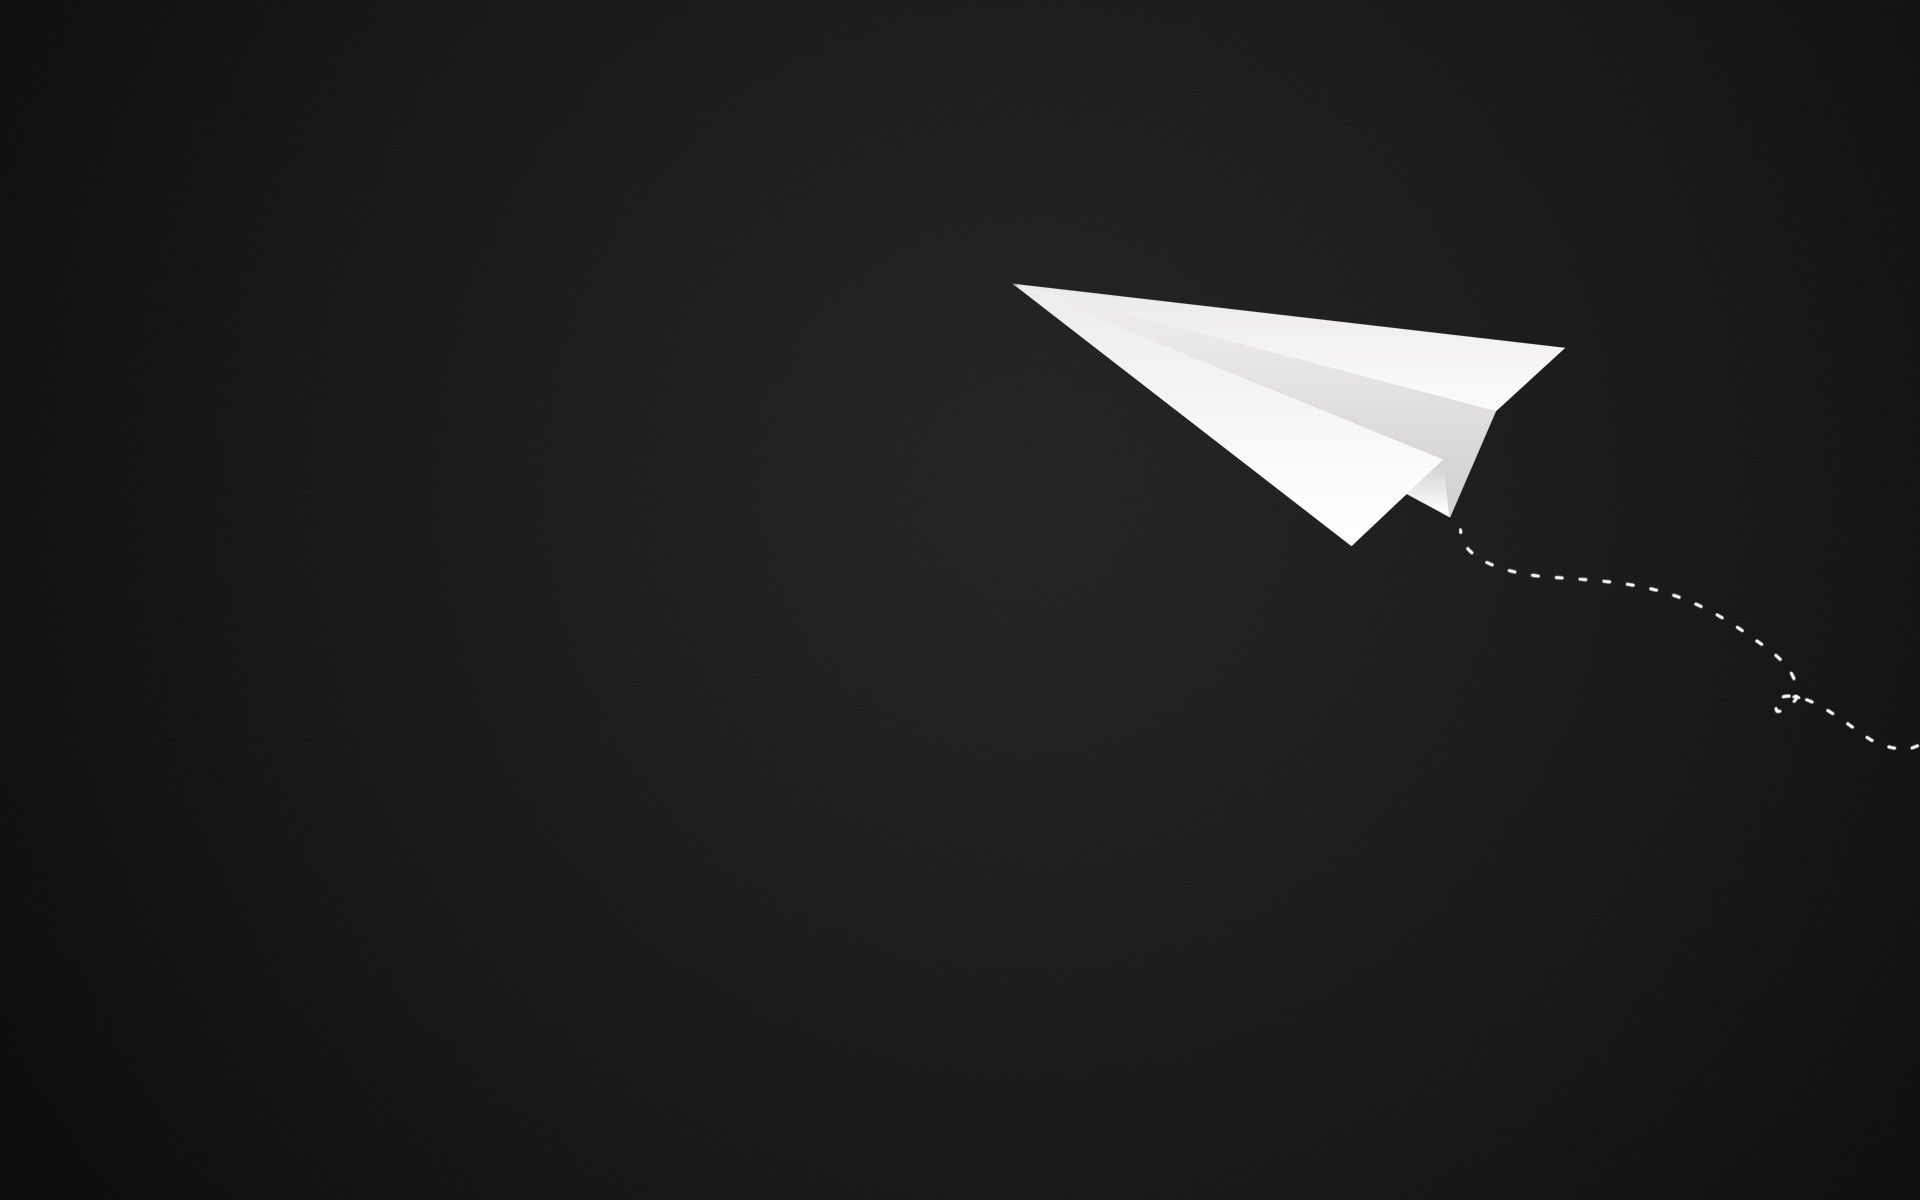 minimalistic monochrome paper plane / 1920x1200 Wallpaper ...